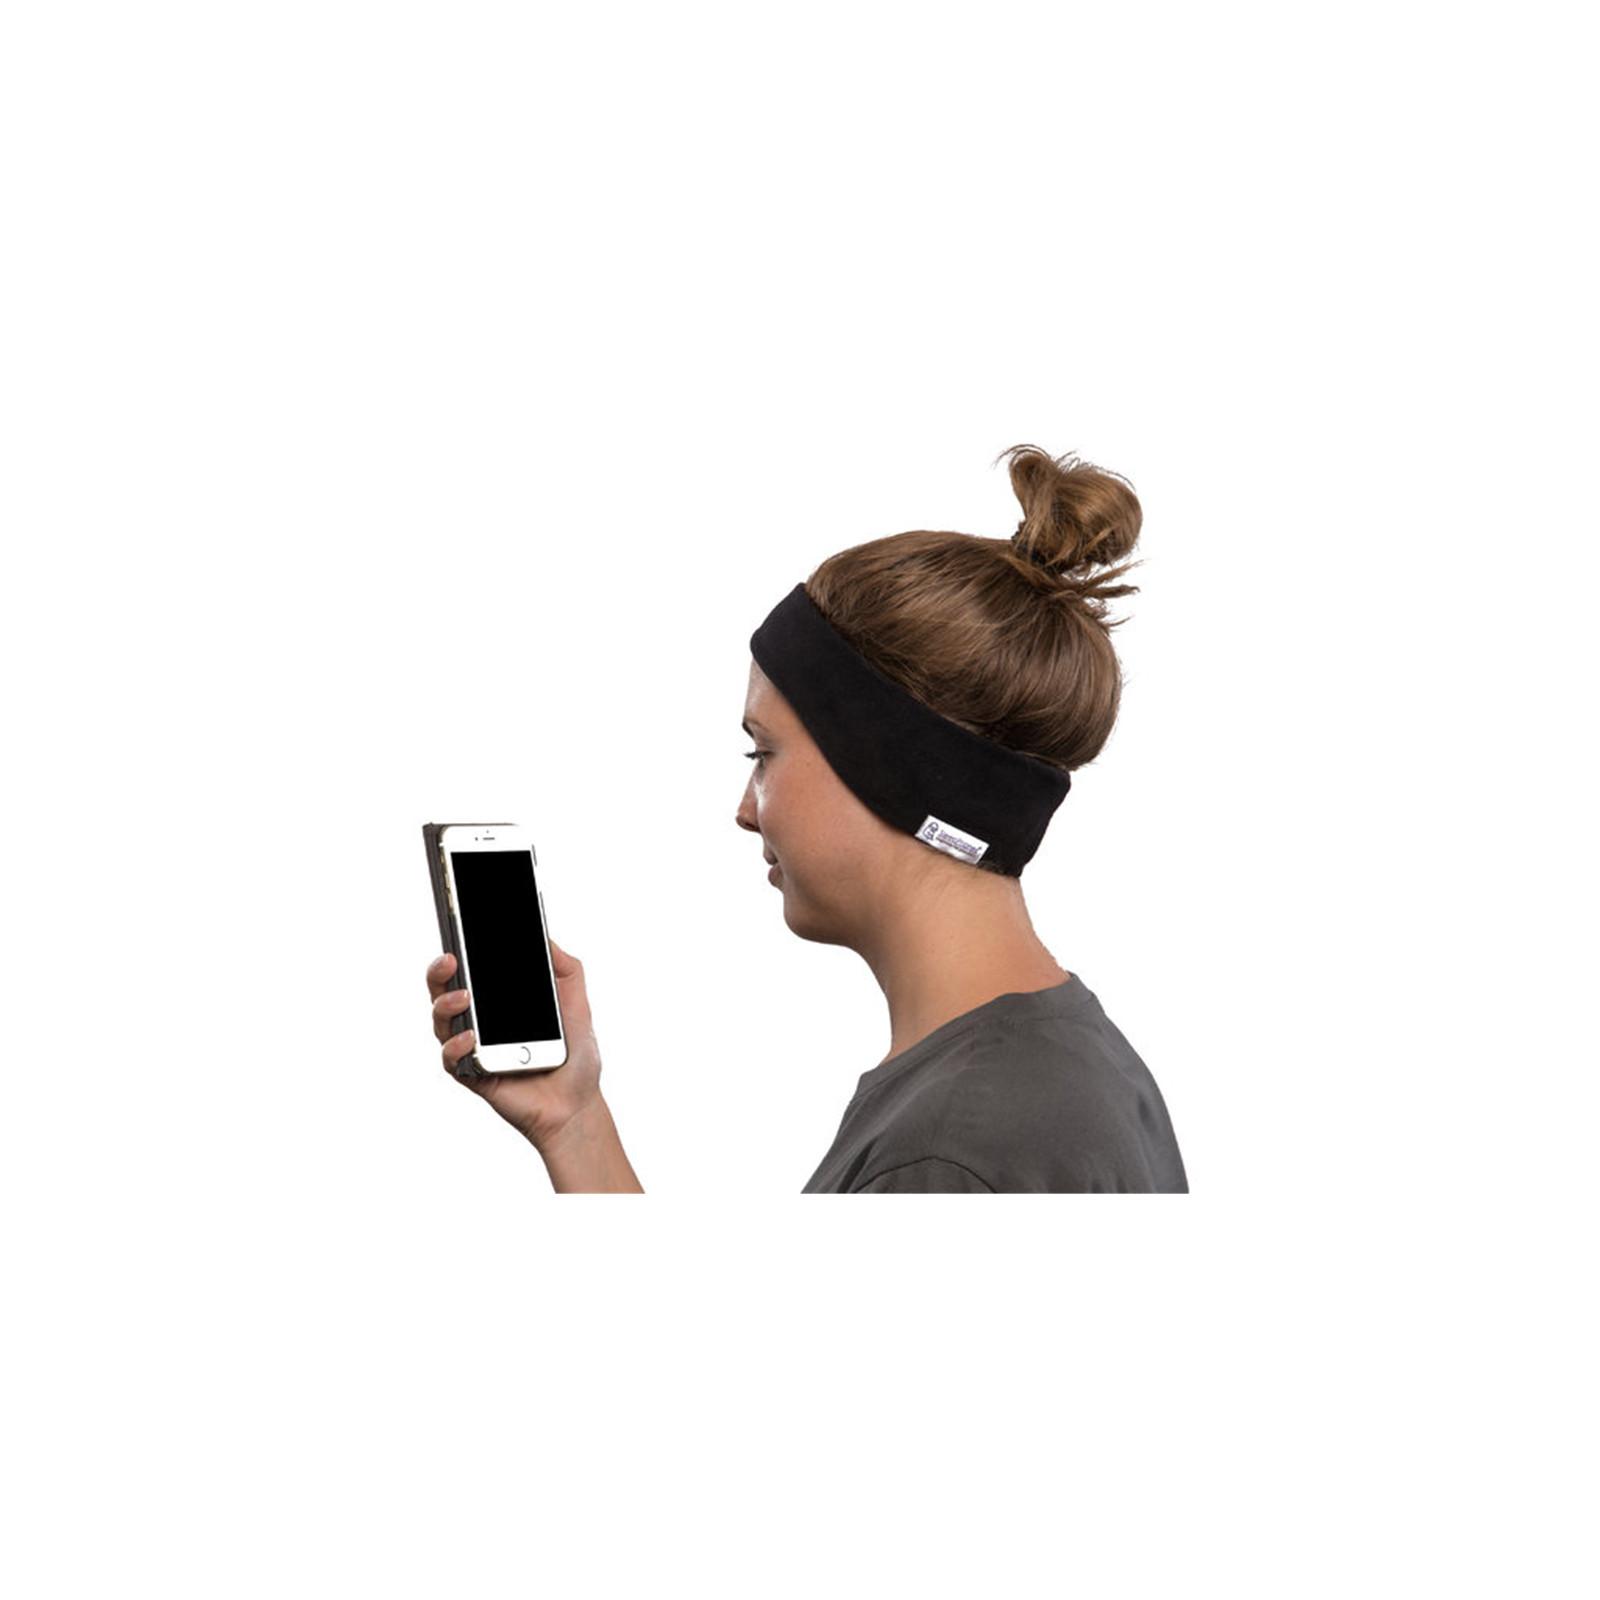 d8919399b4f Buy the SleepPhones SB6GL-US Wireless - Large - Fleece Fabric - Soft ...